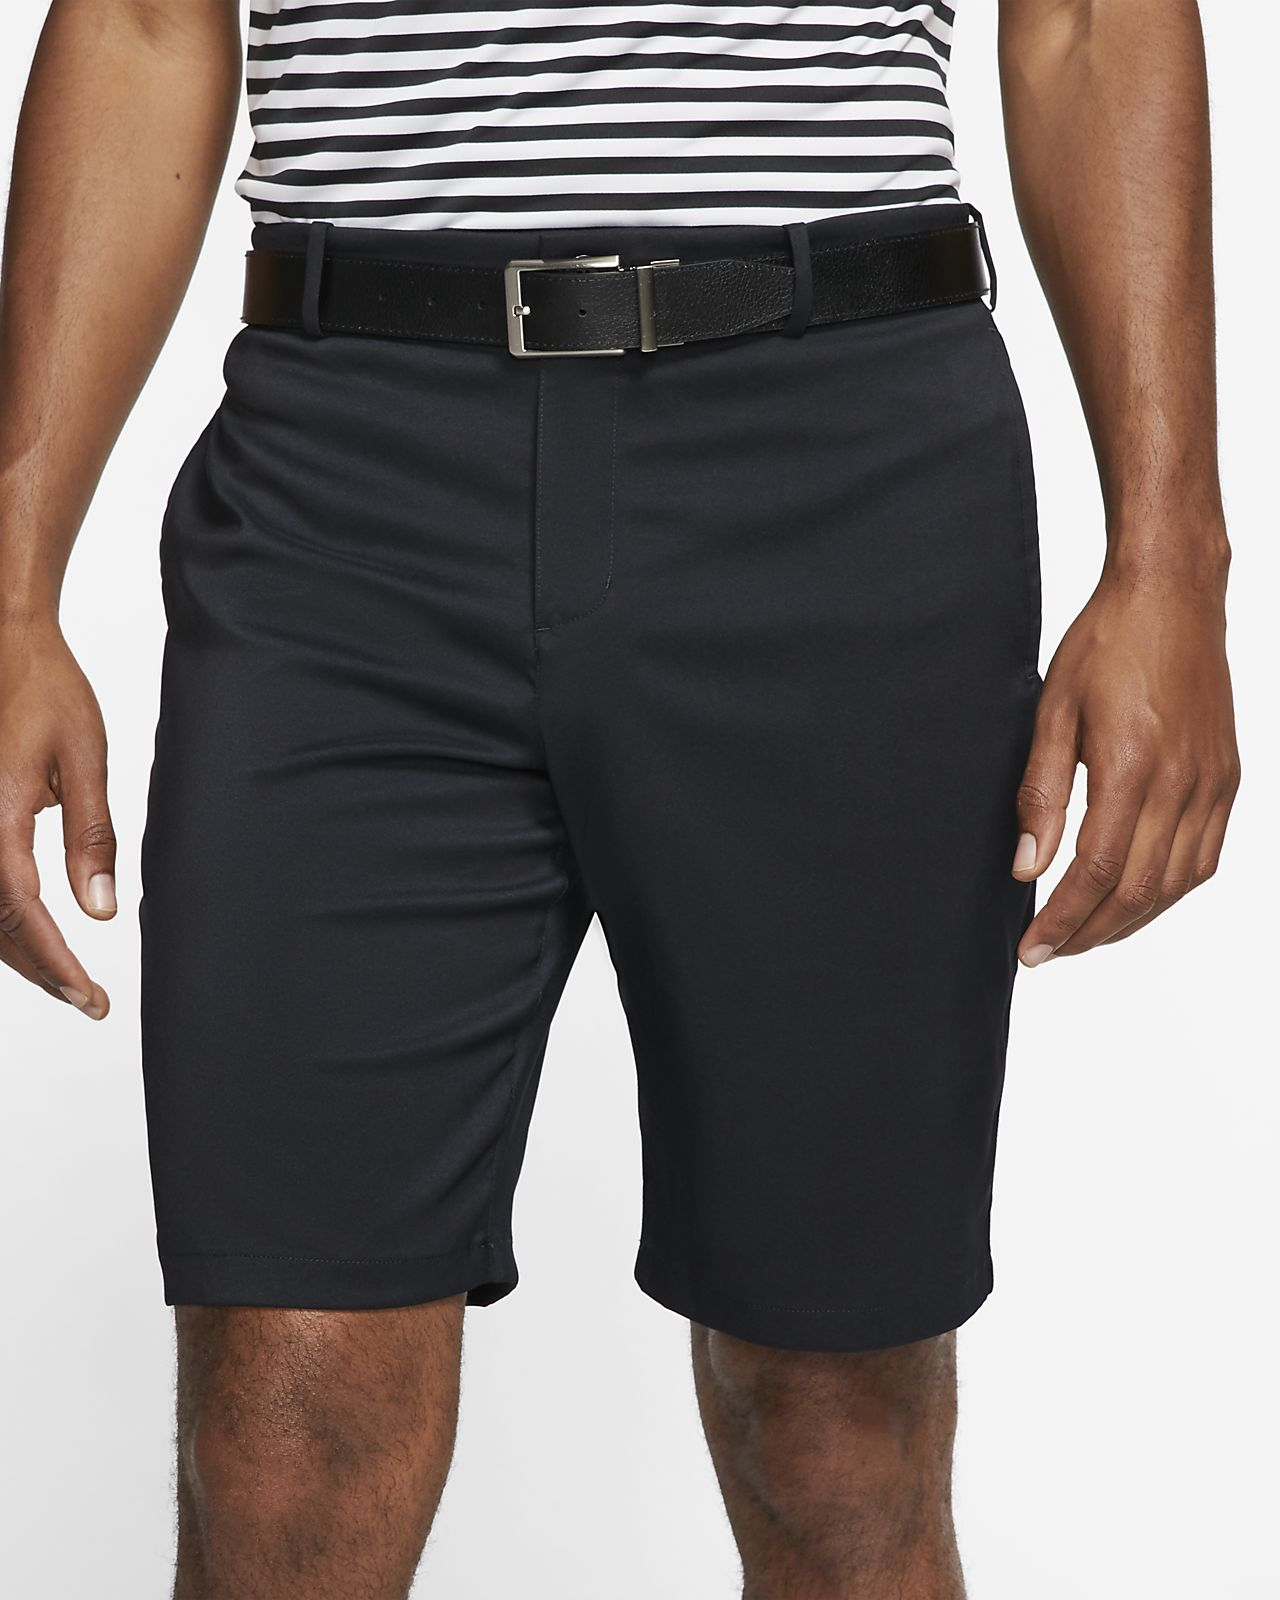 Nike Flex Pantalons curts de golf - Home